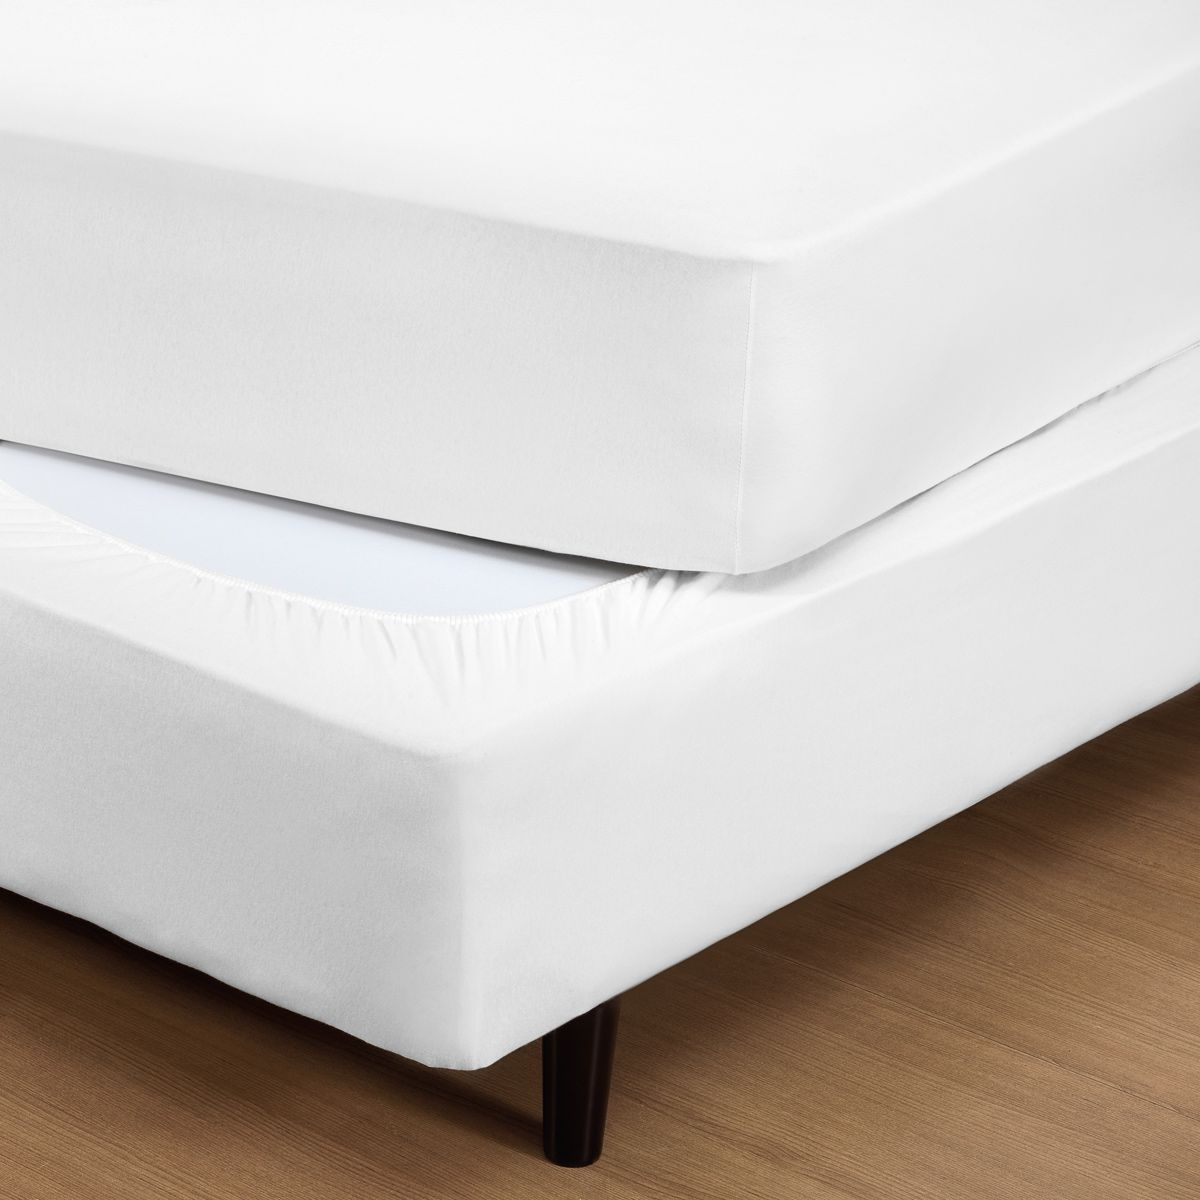 Capa p/ Box Fit Box Branco Casal Padrão - Malha 100% Algodão